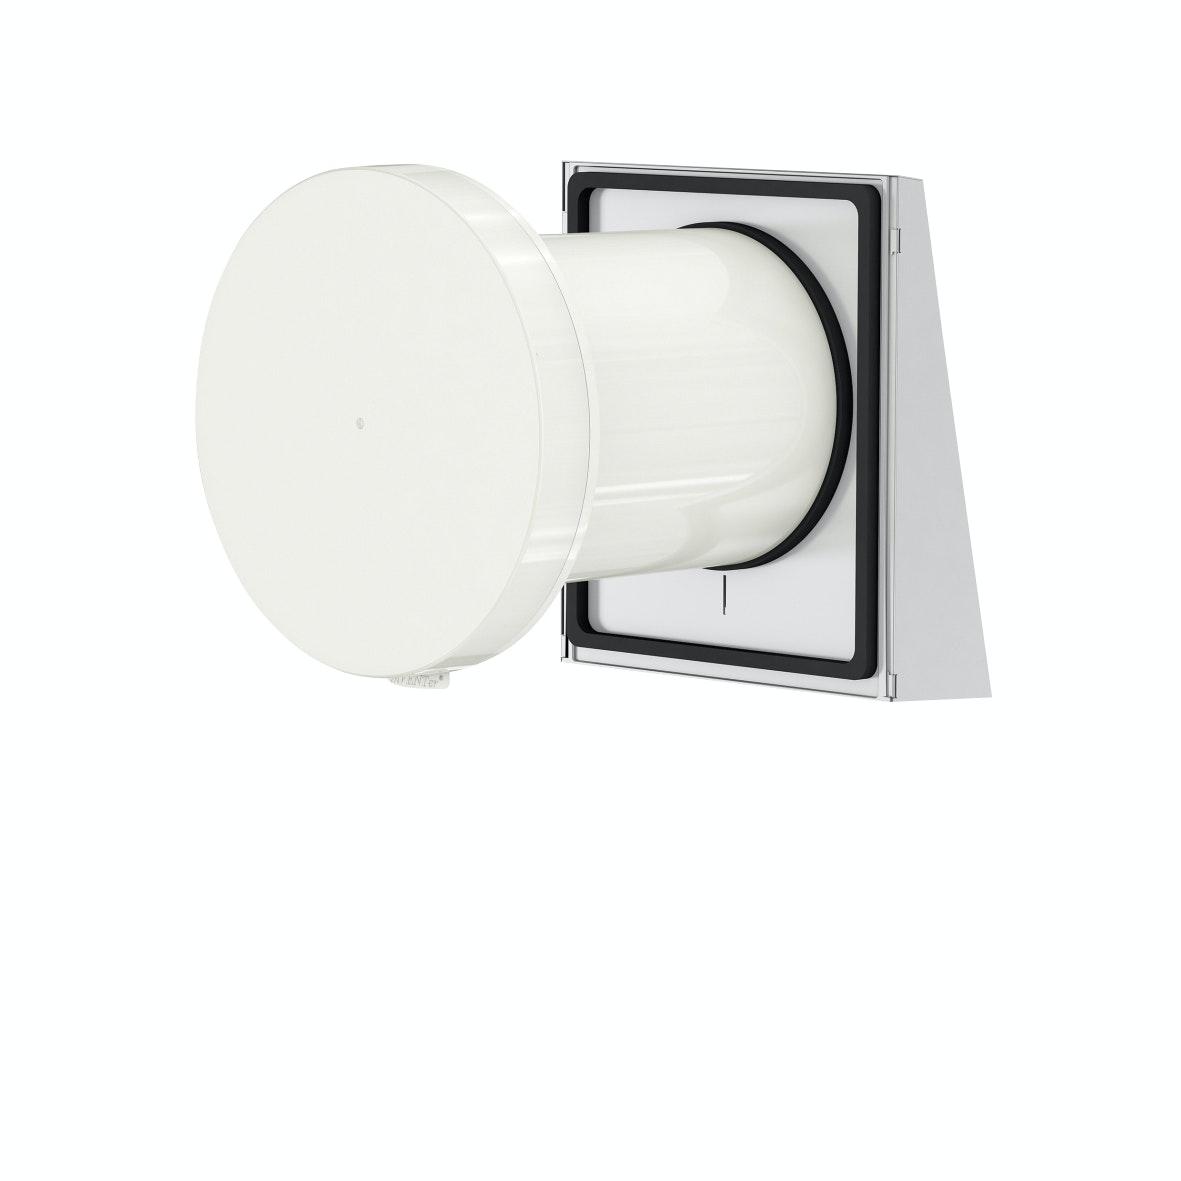 Ventilationaggregat Pax Mistral Iv14 1150-2